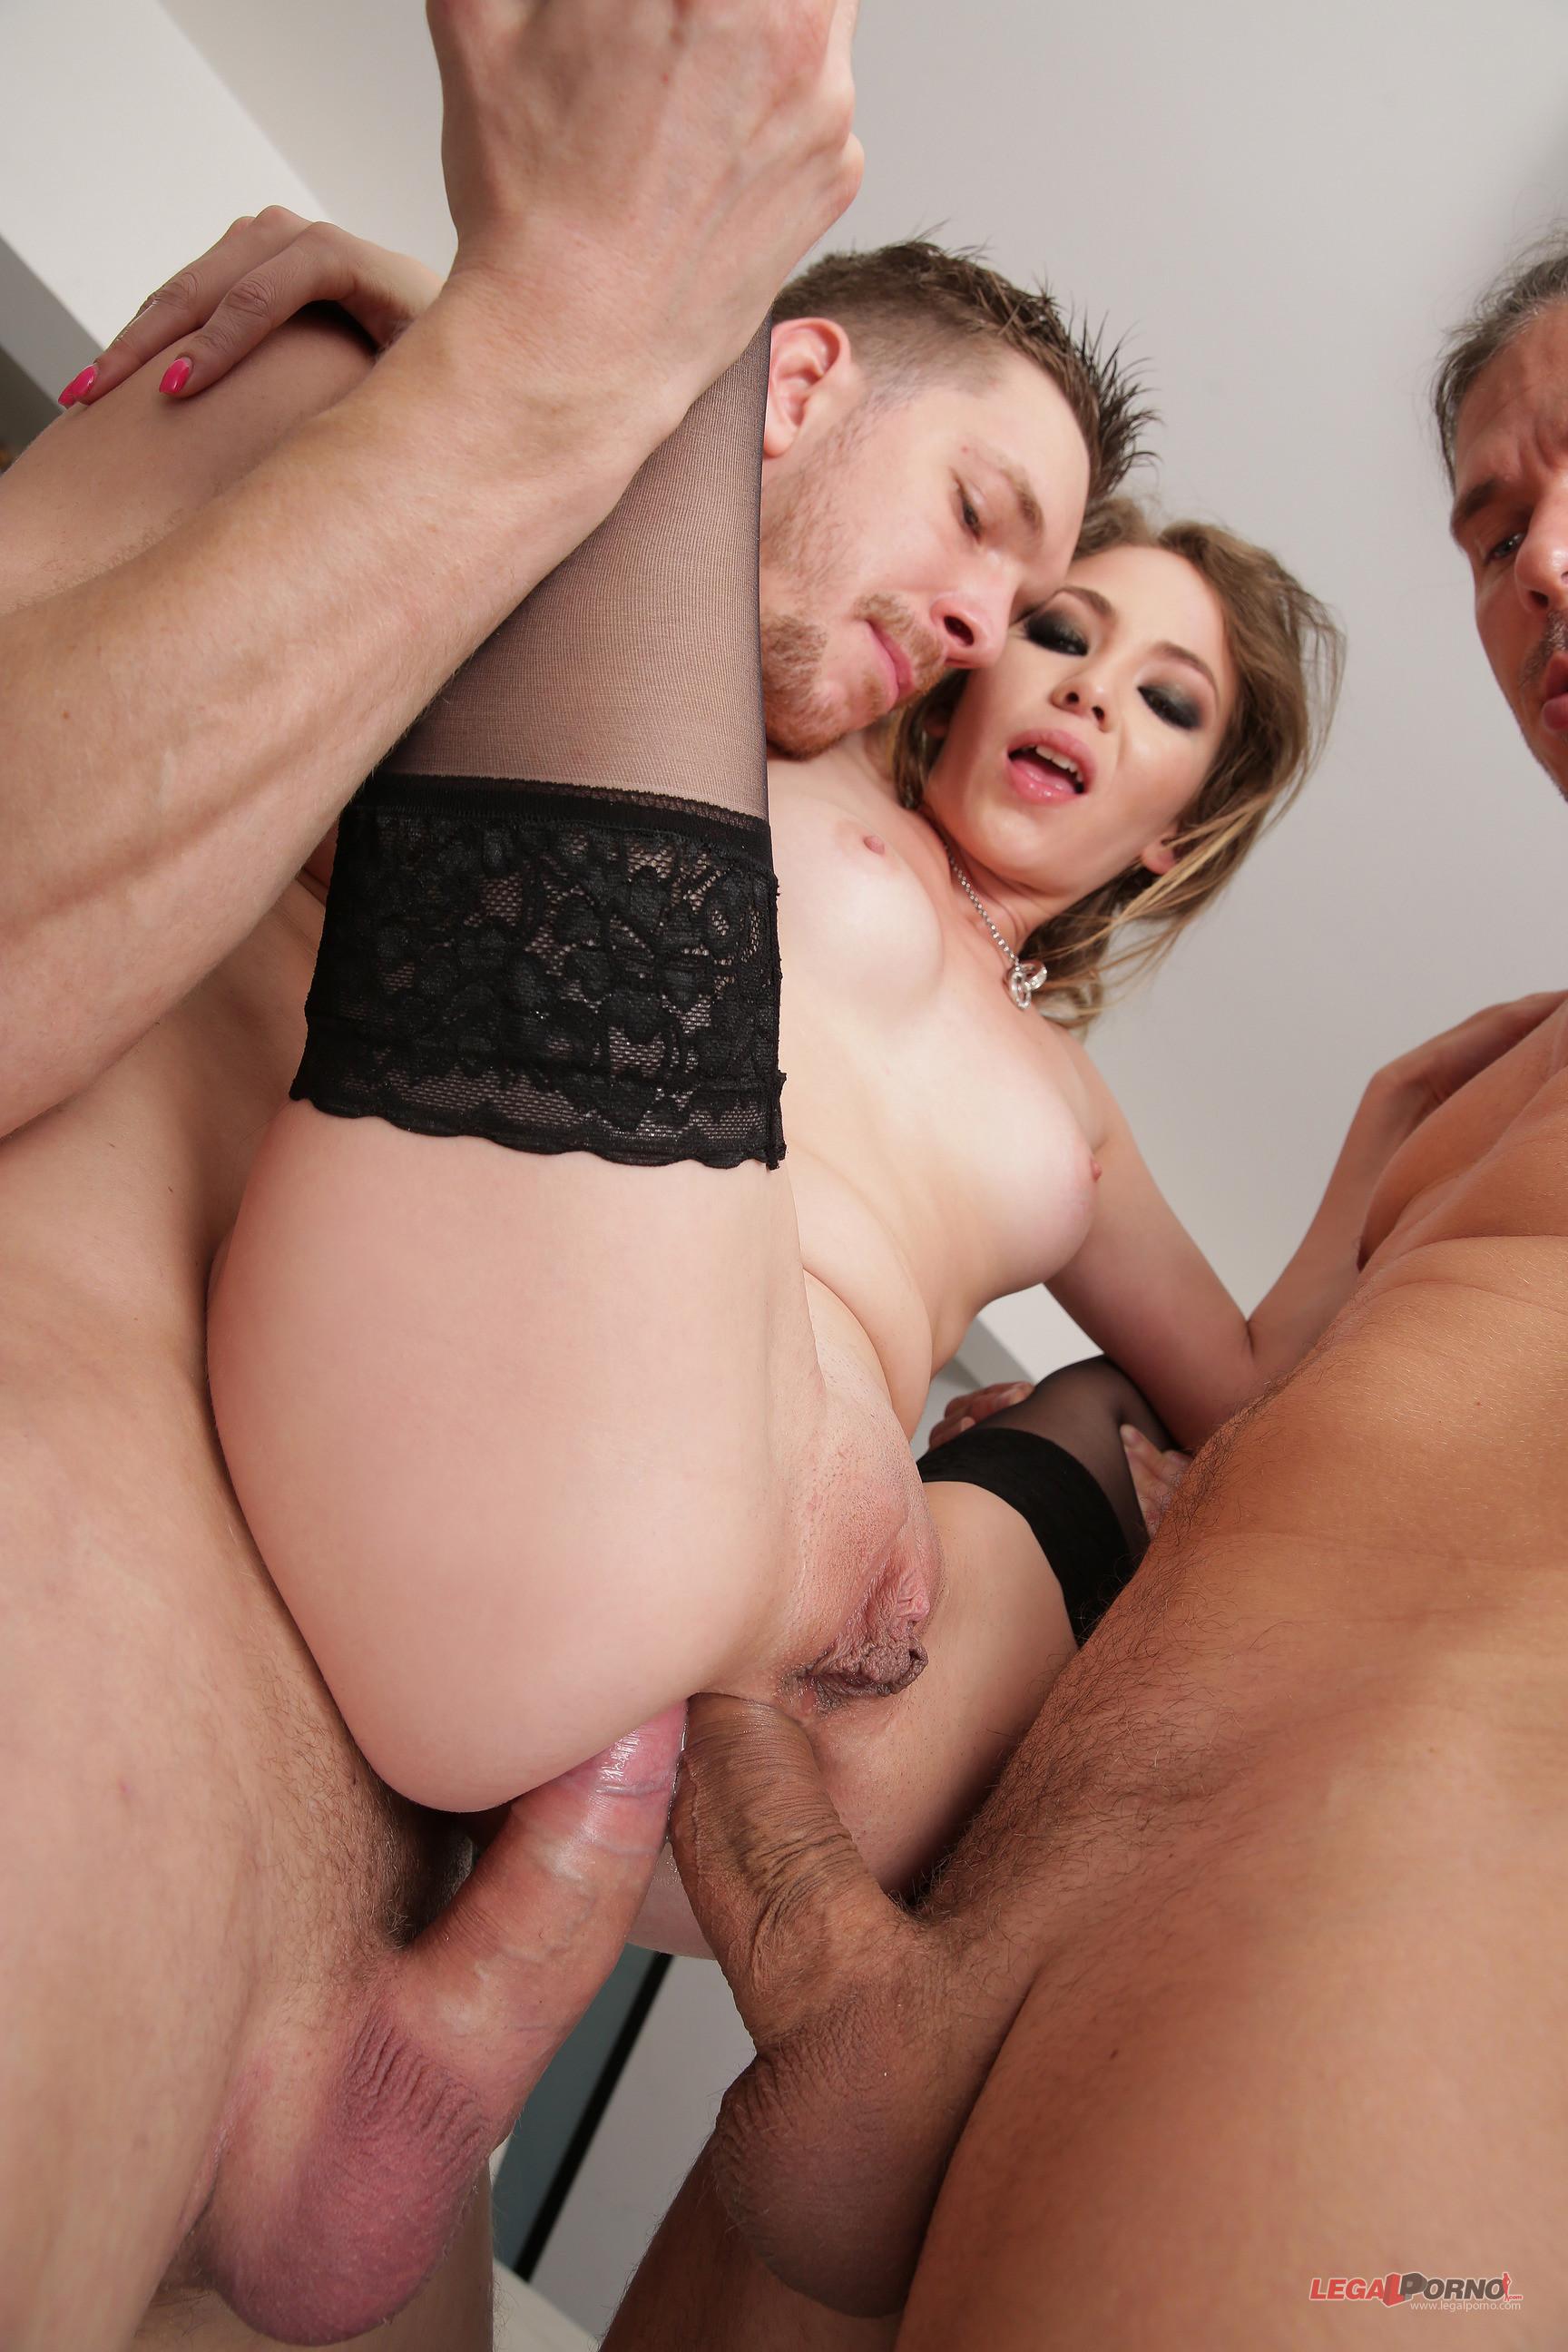 Slutty ass gape and a double penetration